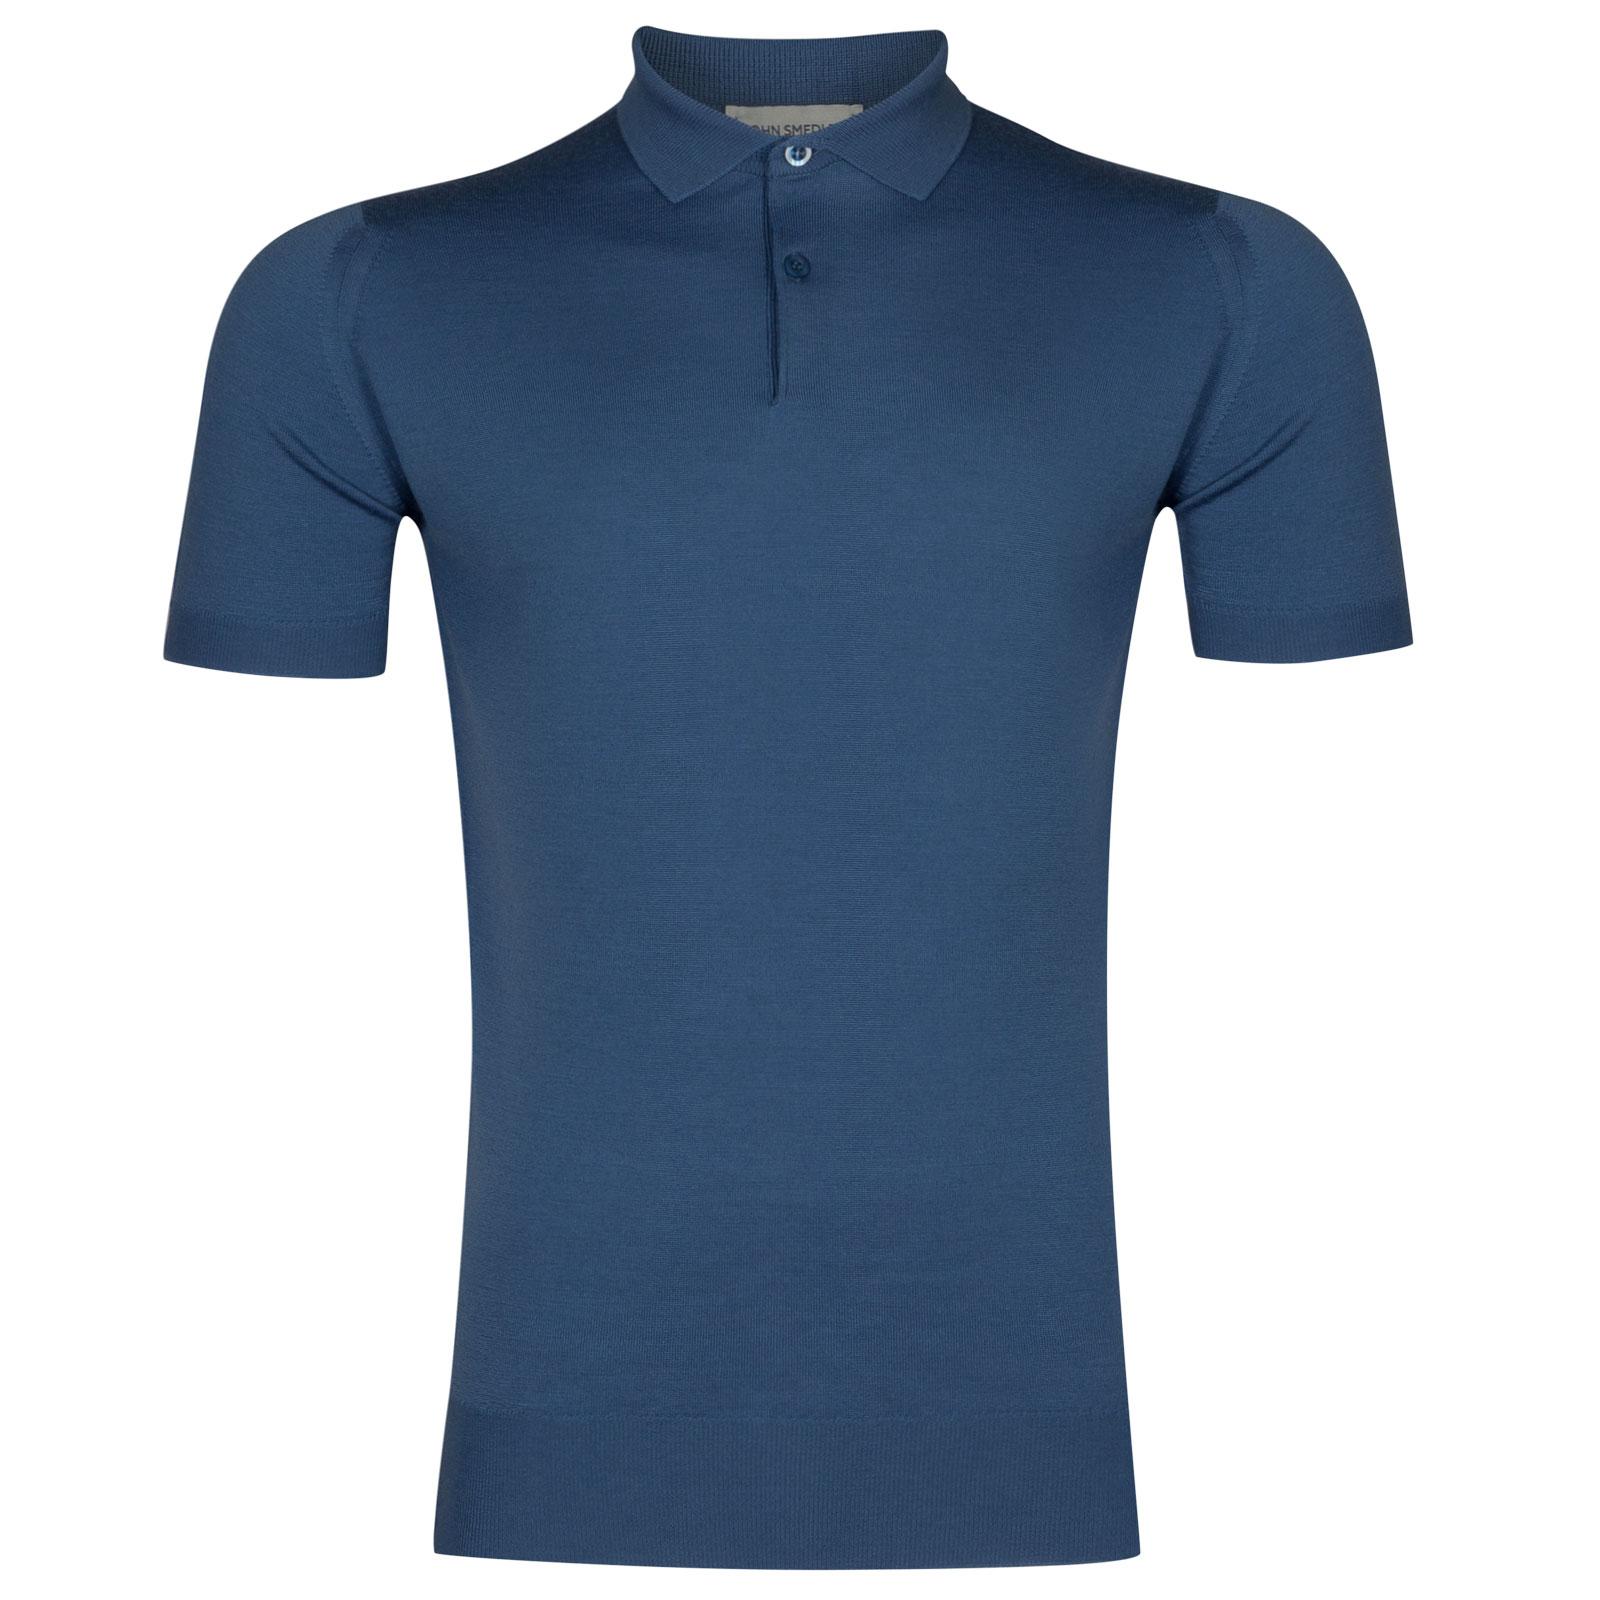 John Smedley payton Merino Wool Shirt in Derwent Blue-XL